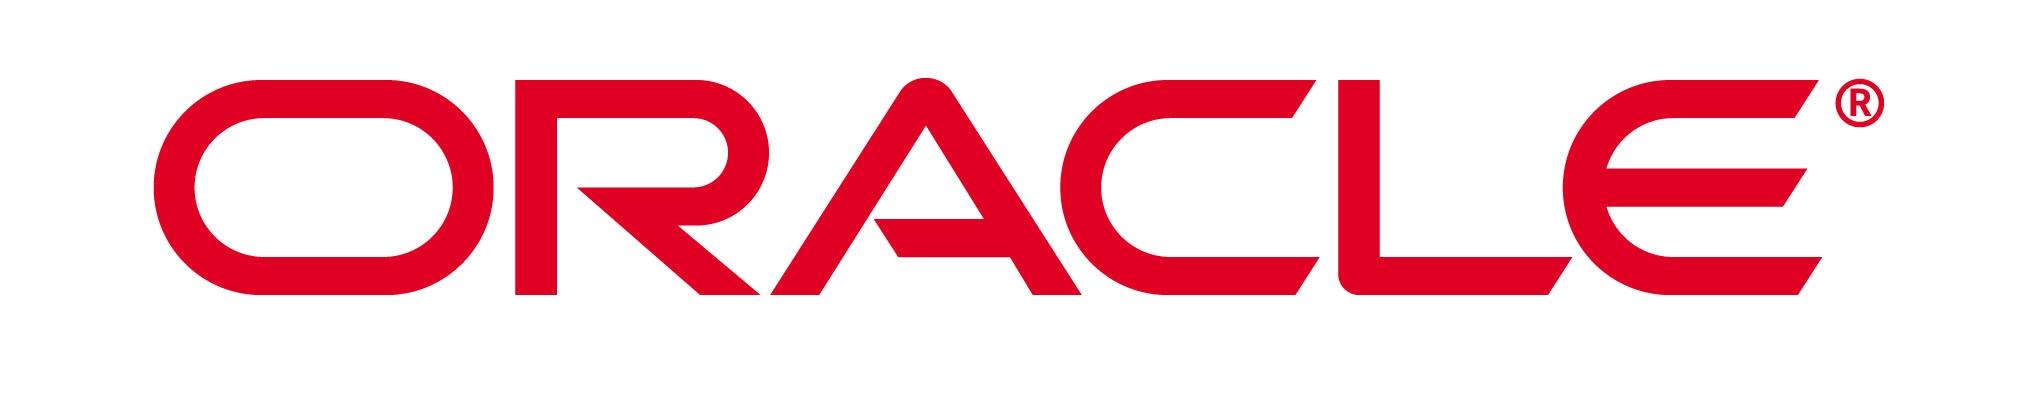 Oracle_2018v2